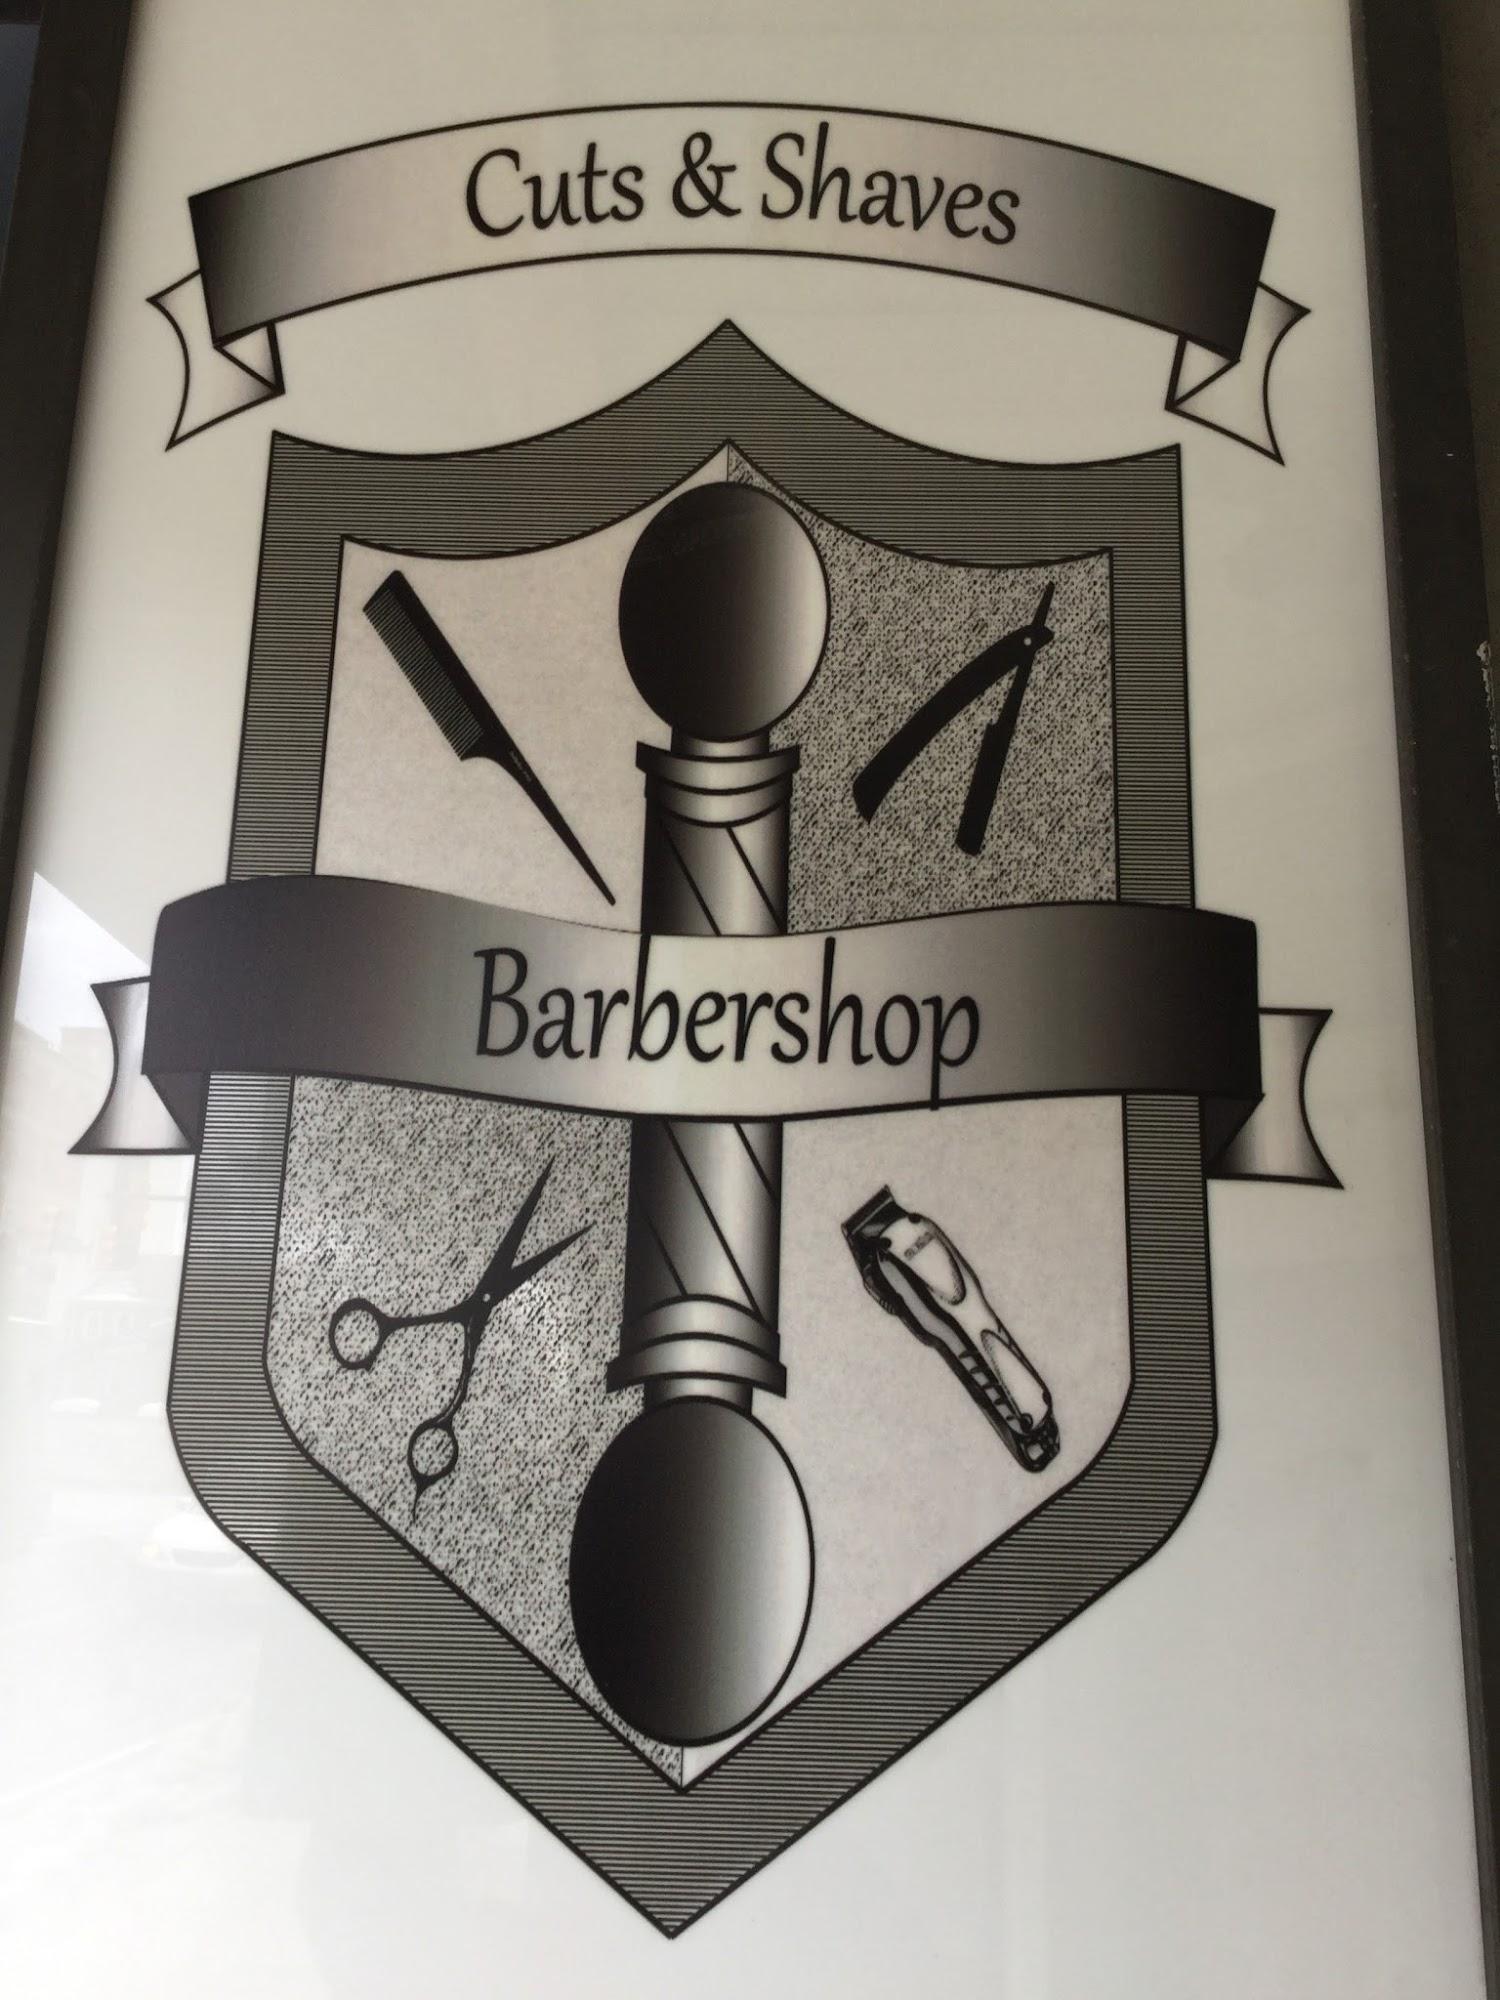 Cuts & Shaves Barbershop 7 N 6th St, Allentown